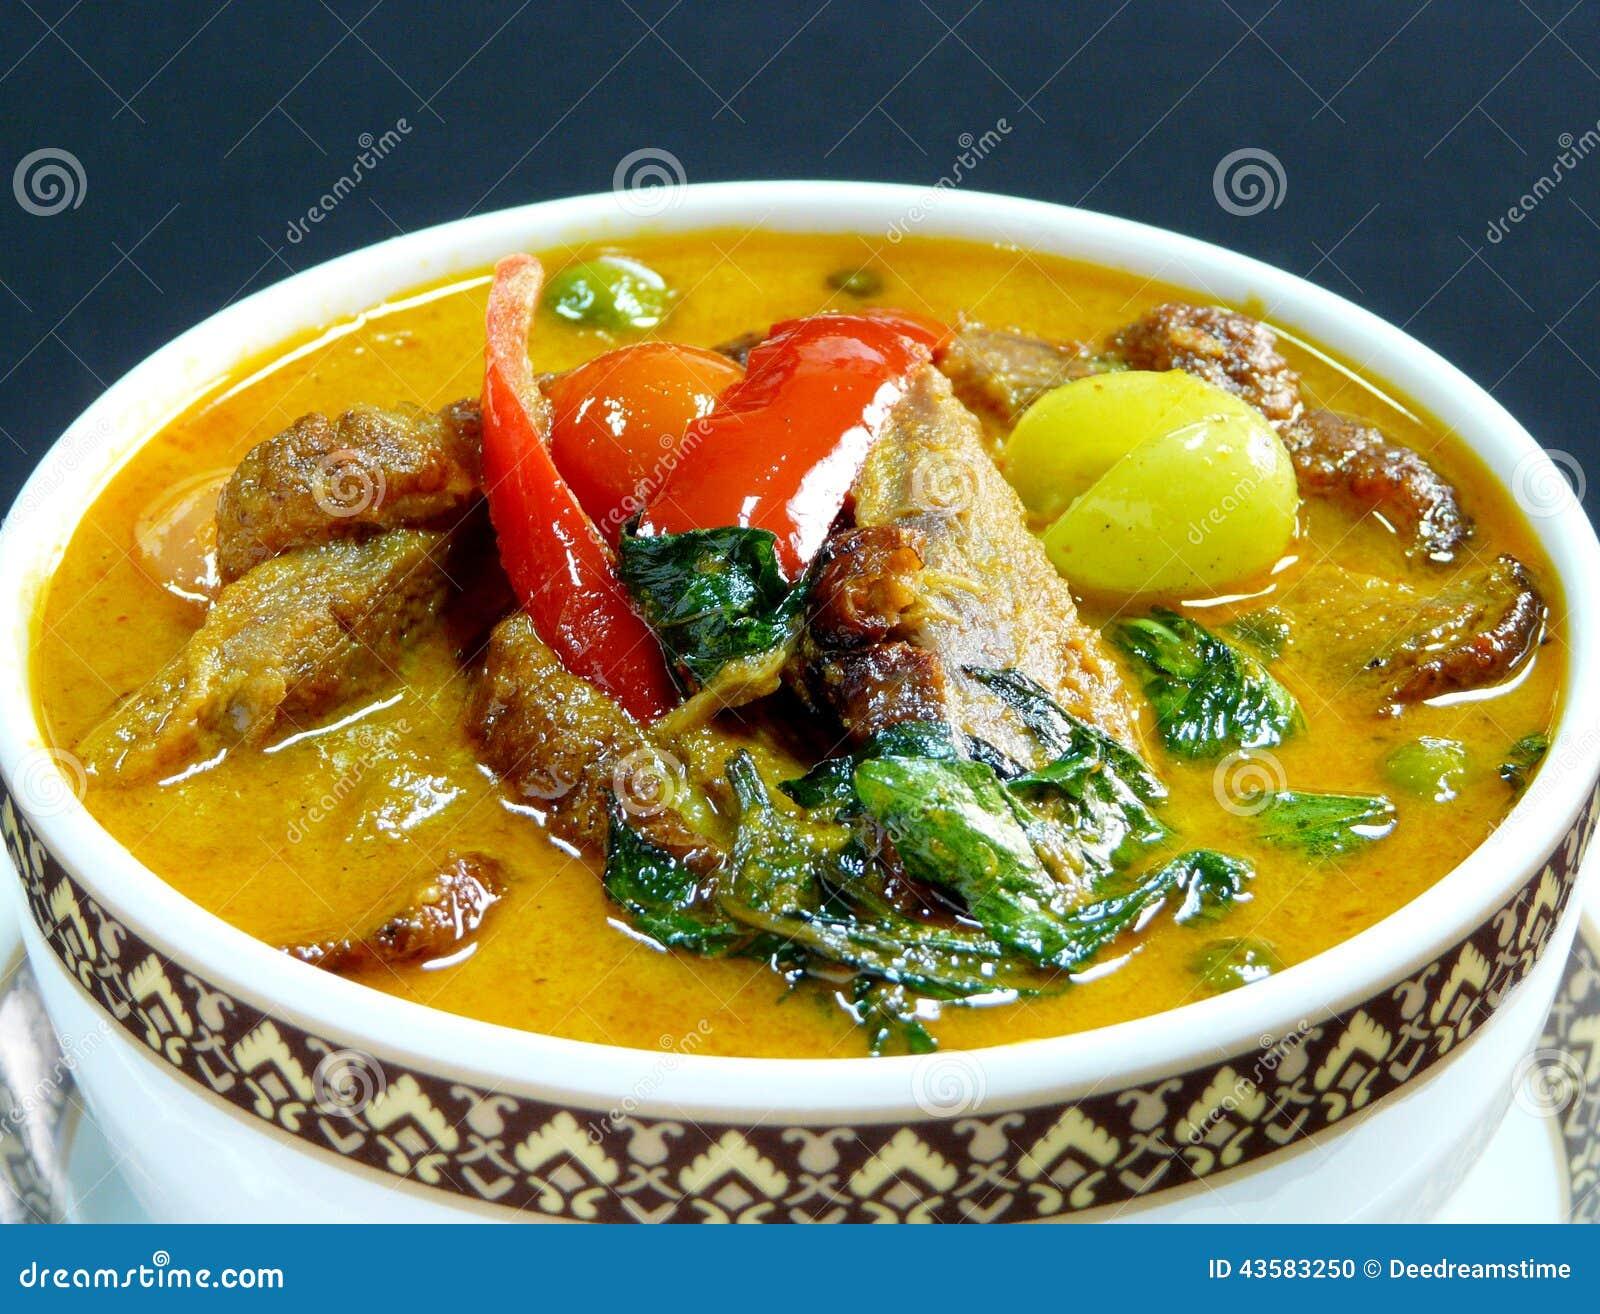 Cuisine Thailandaise Cari Rouge Avec Le Canard De Roti Photo Stock